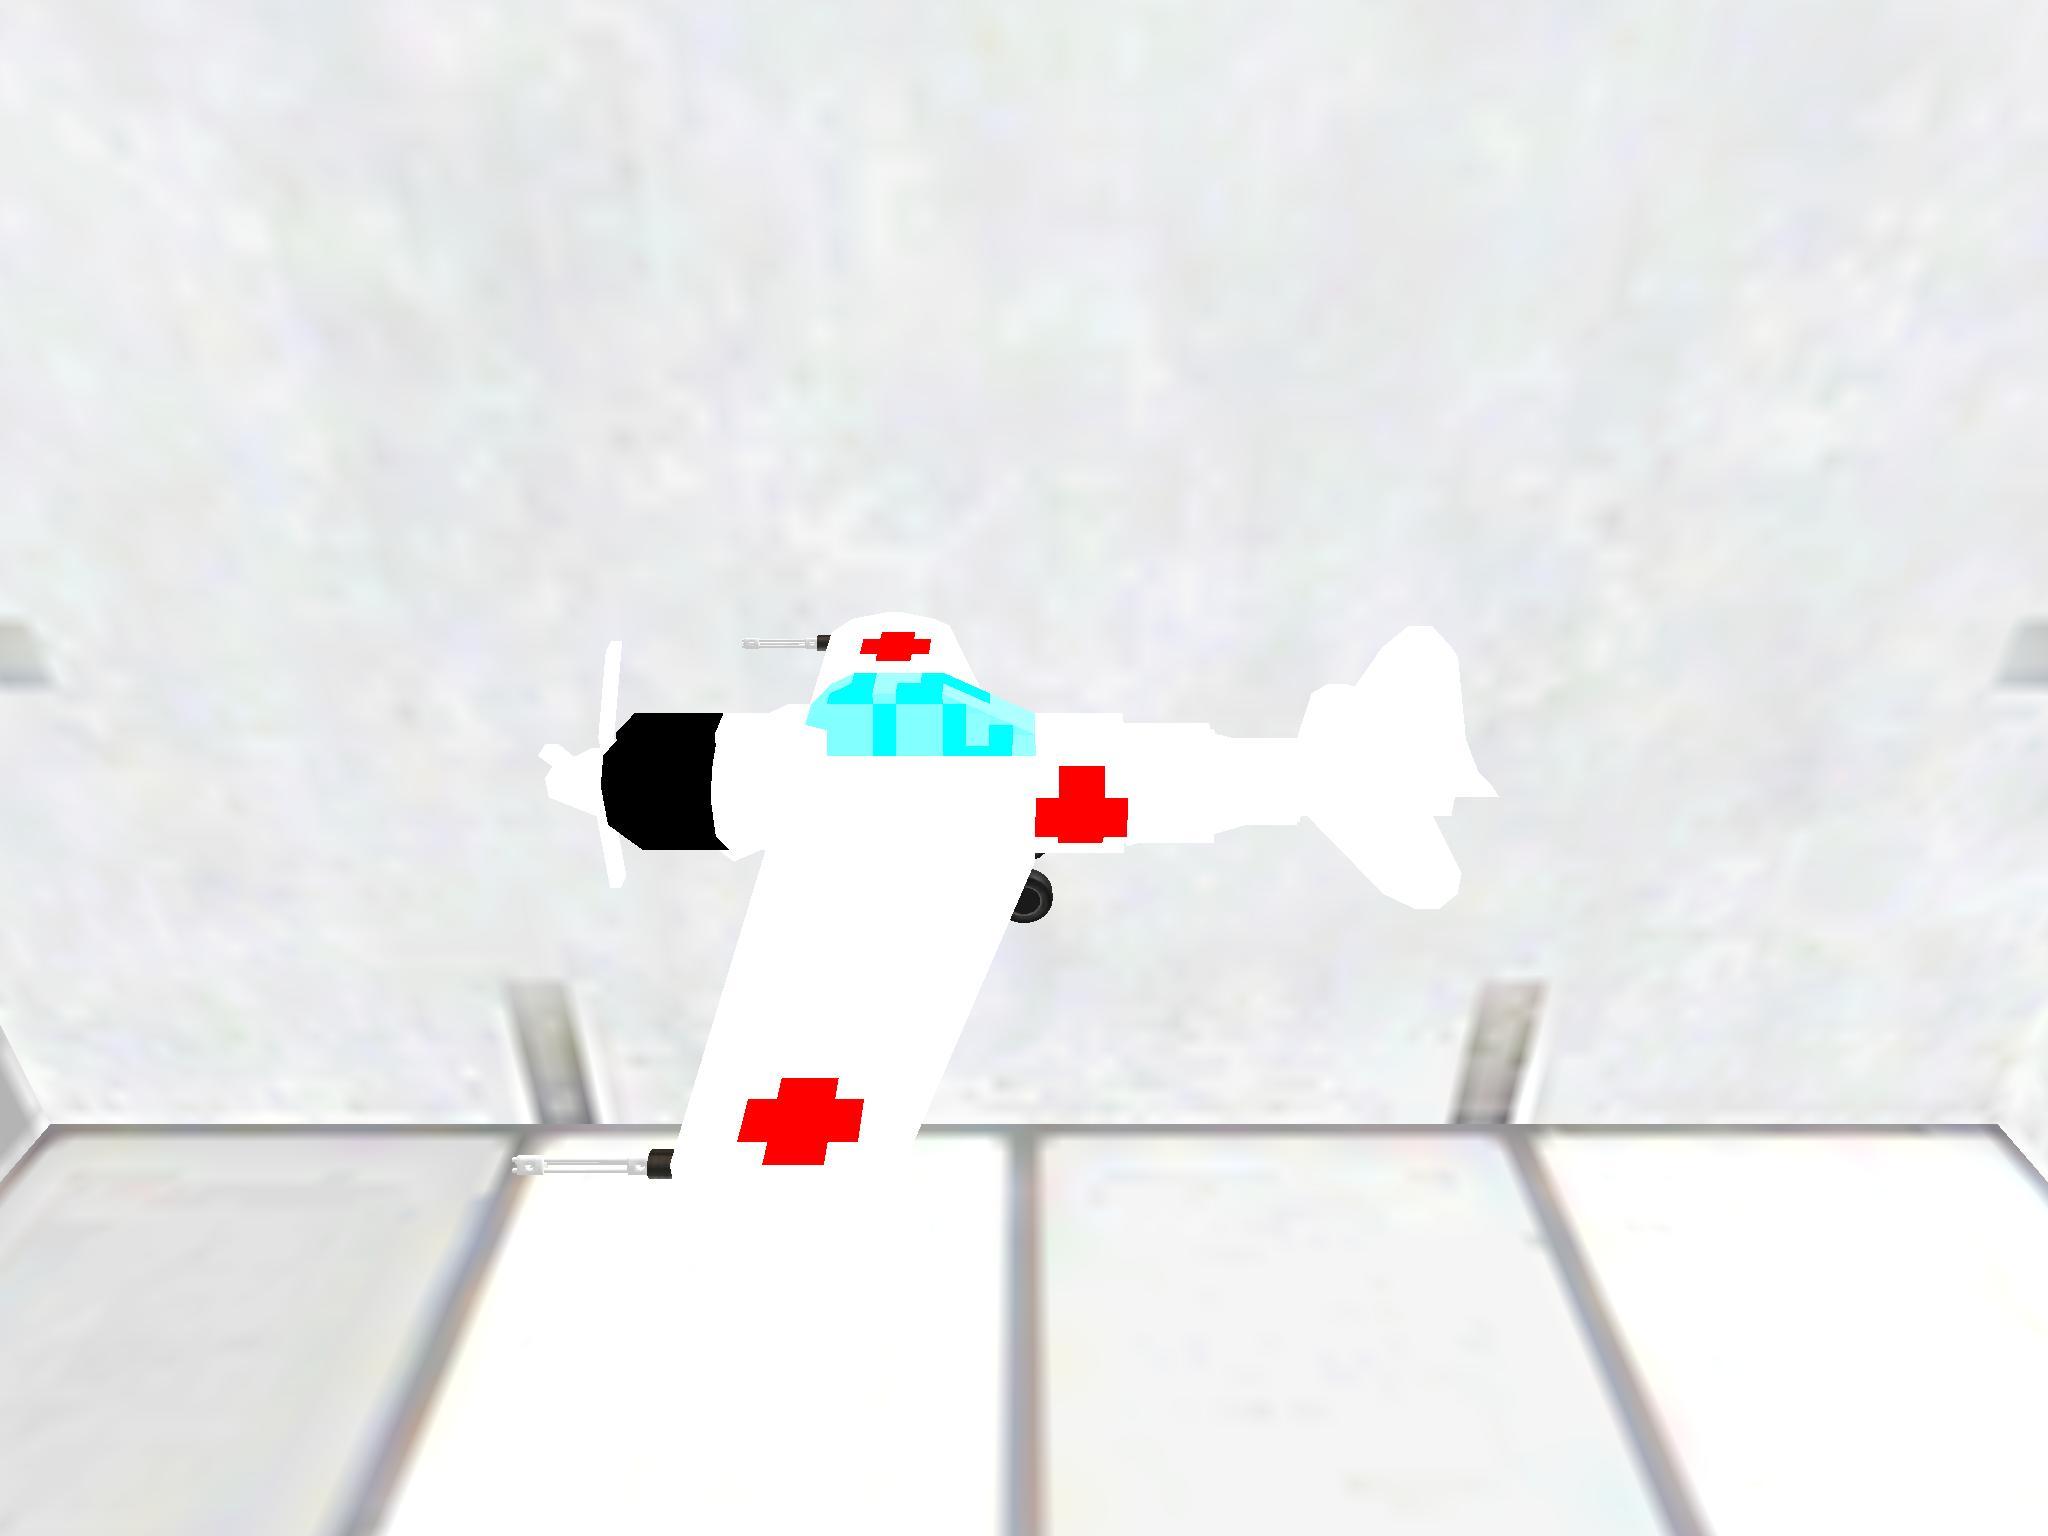 Hospital plane